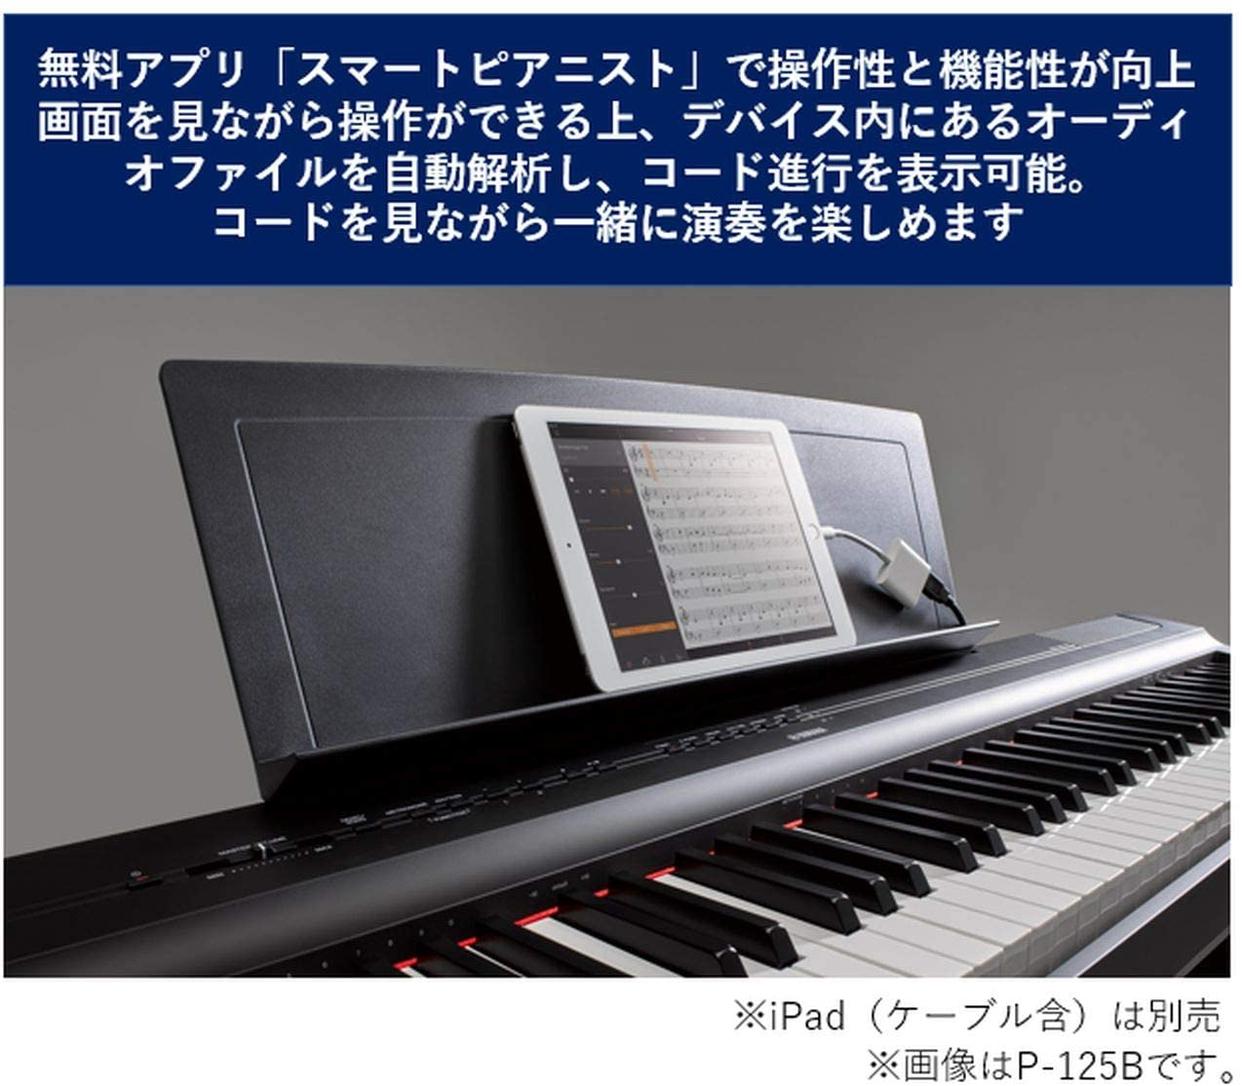 YAMAHA(ヤマハ) P-125の商品画像9